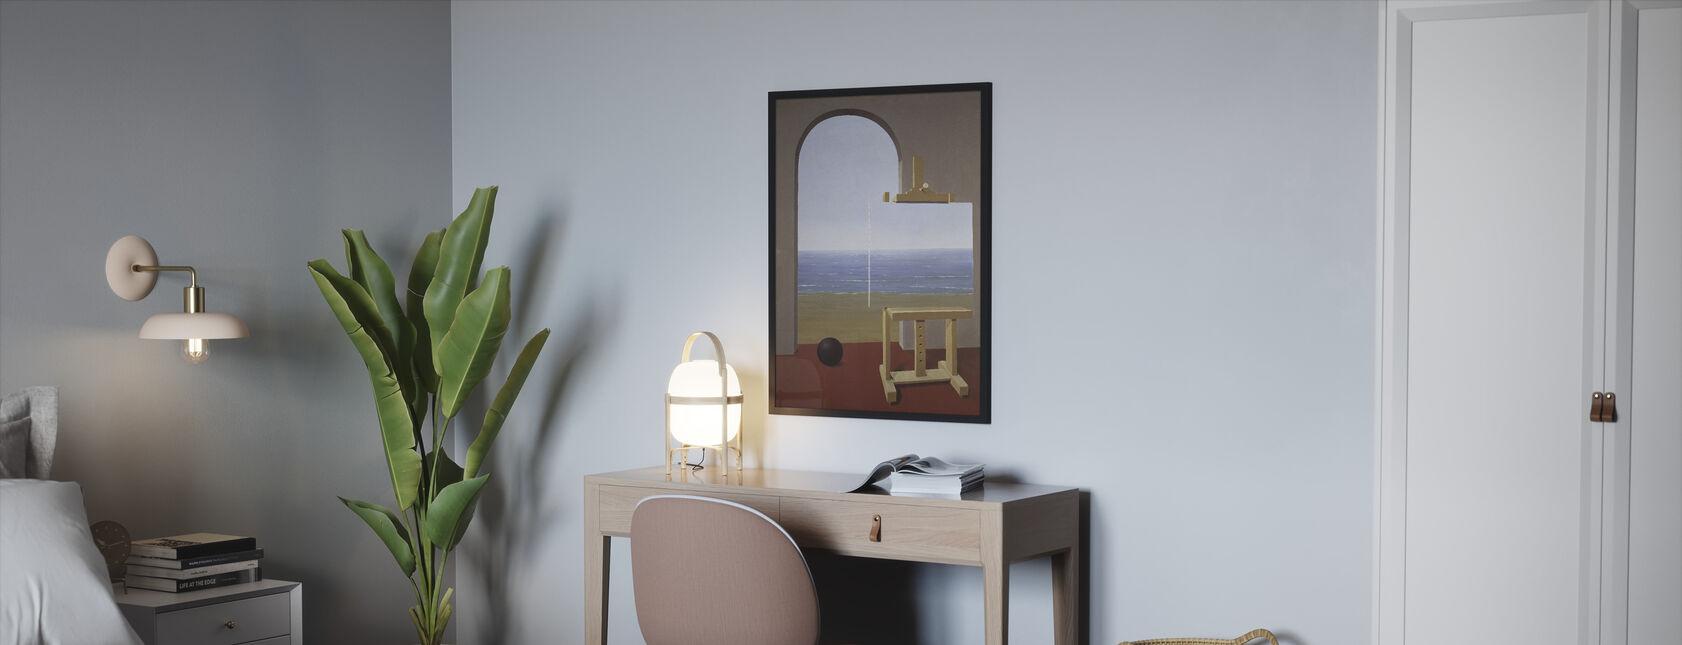 Human Condition - Rene Magritte - Framed print - Bedroom